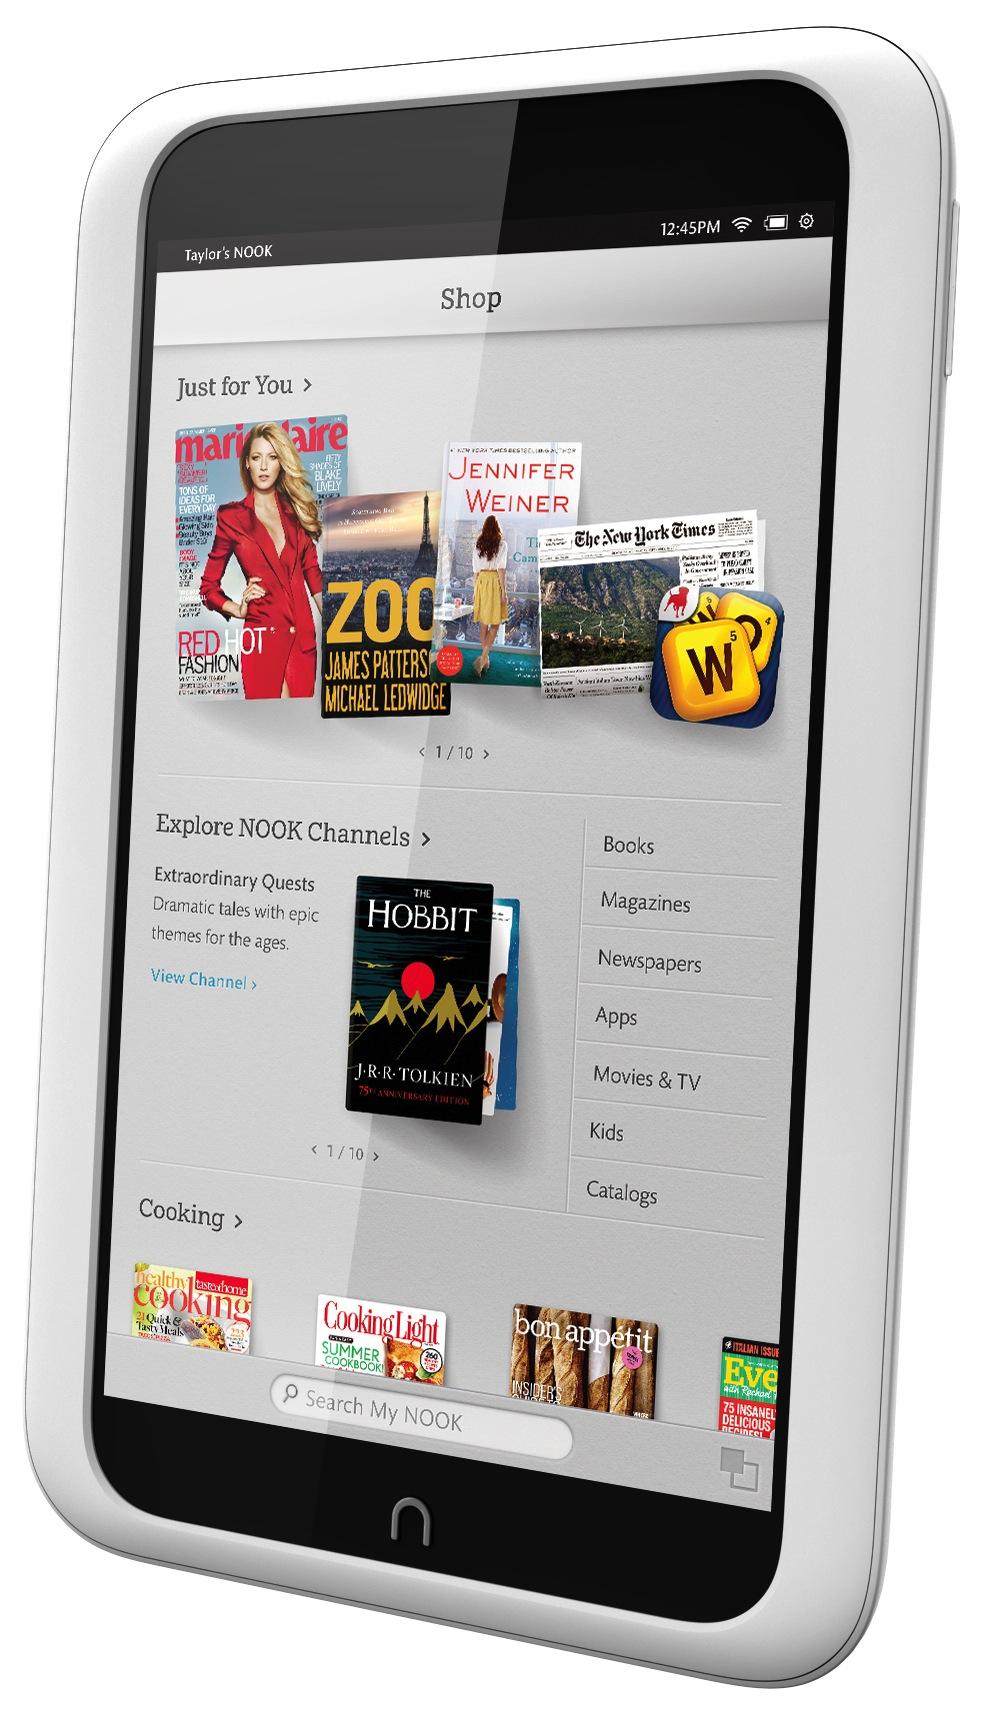 Barnes & Noble Nook HD shopping